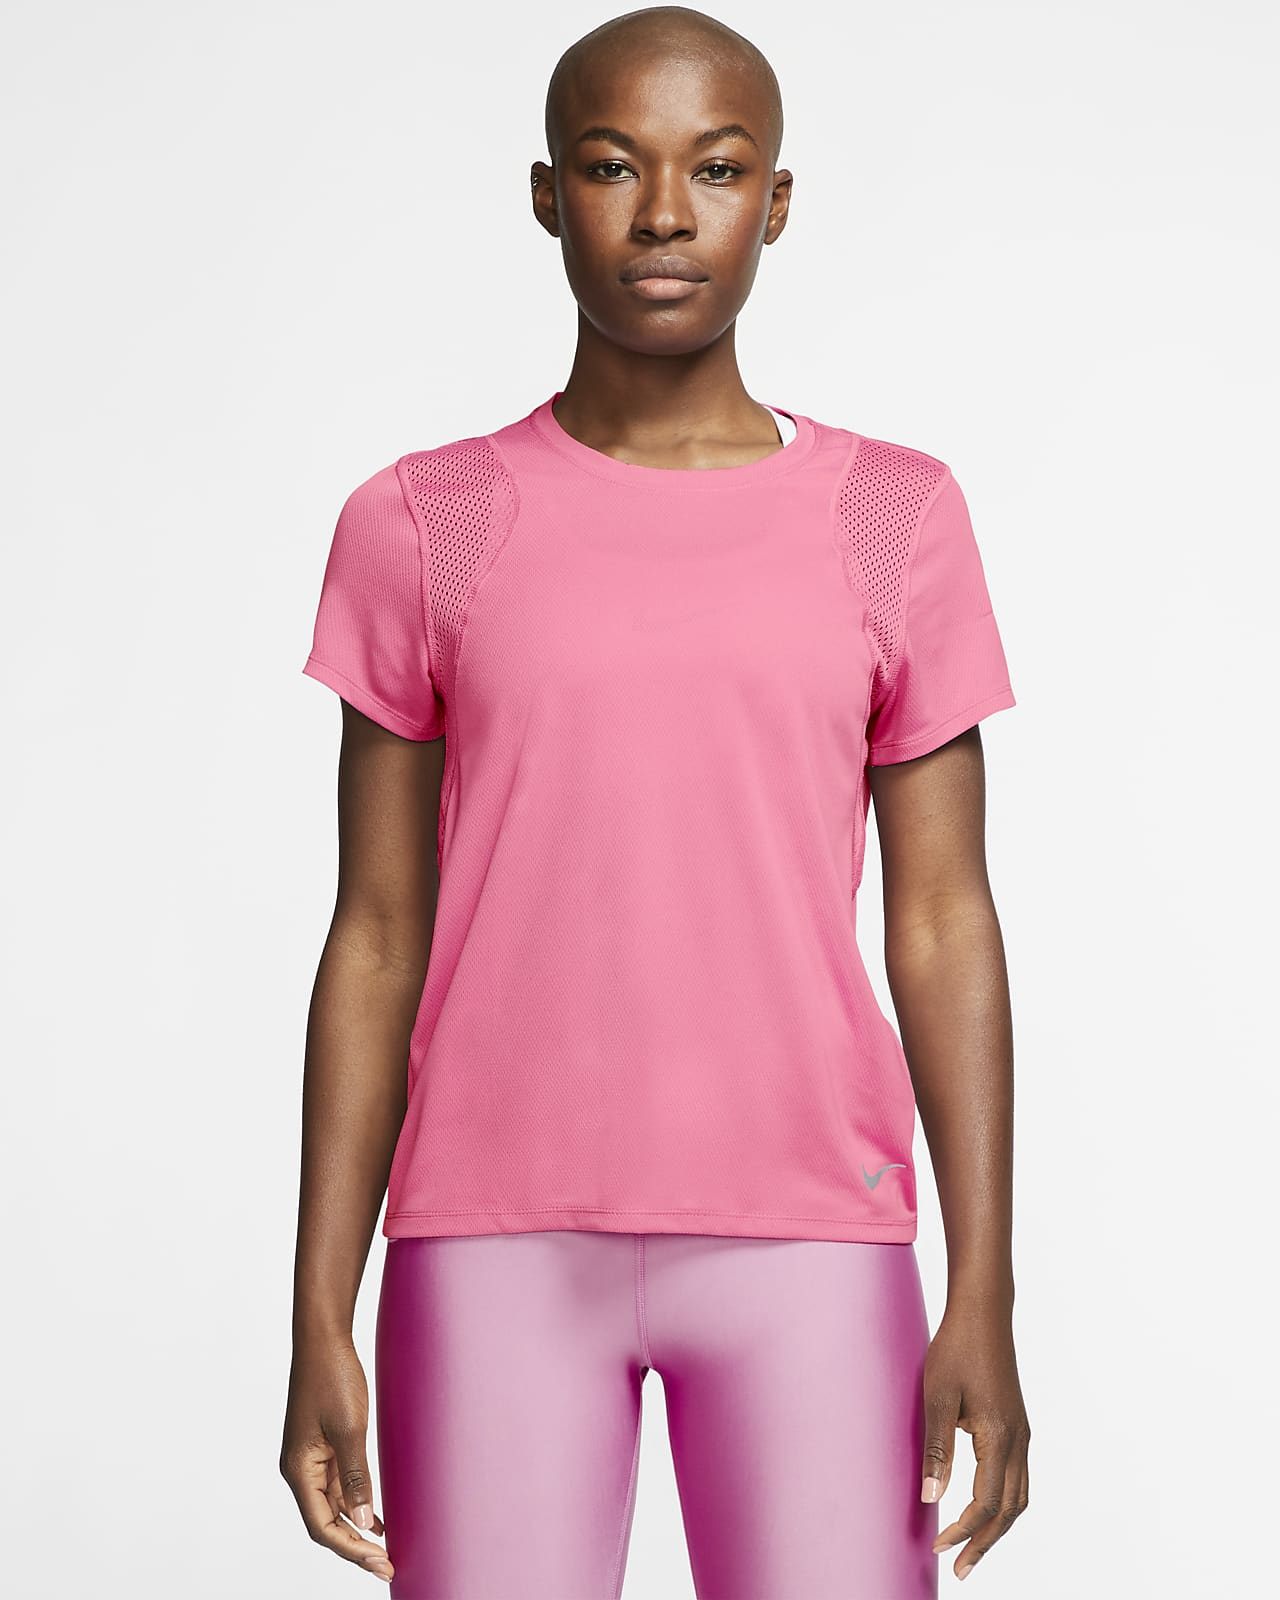 Nike Run Women's Short-Sleeve Running Top